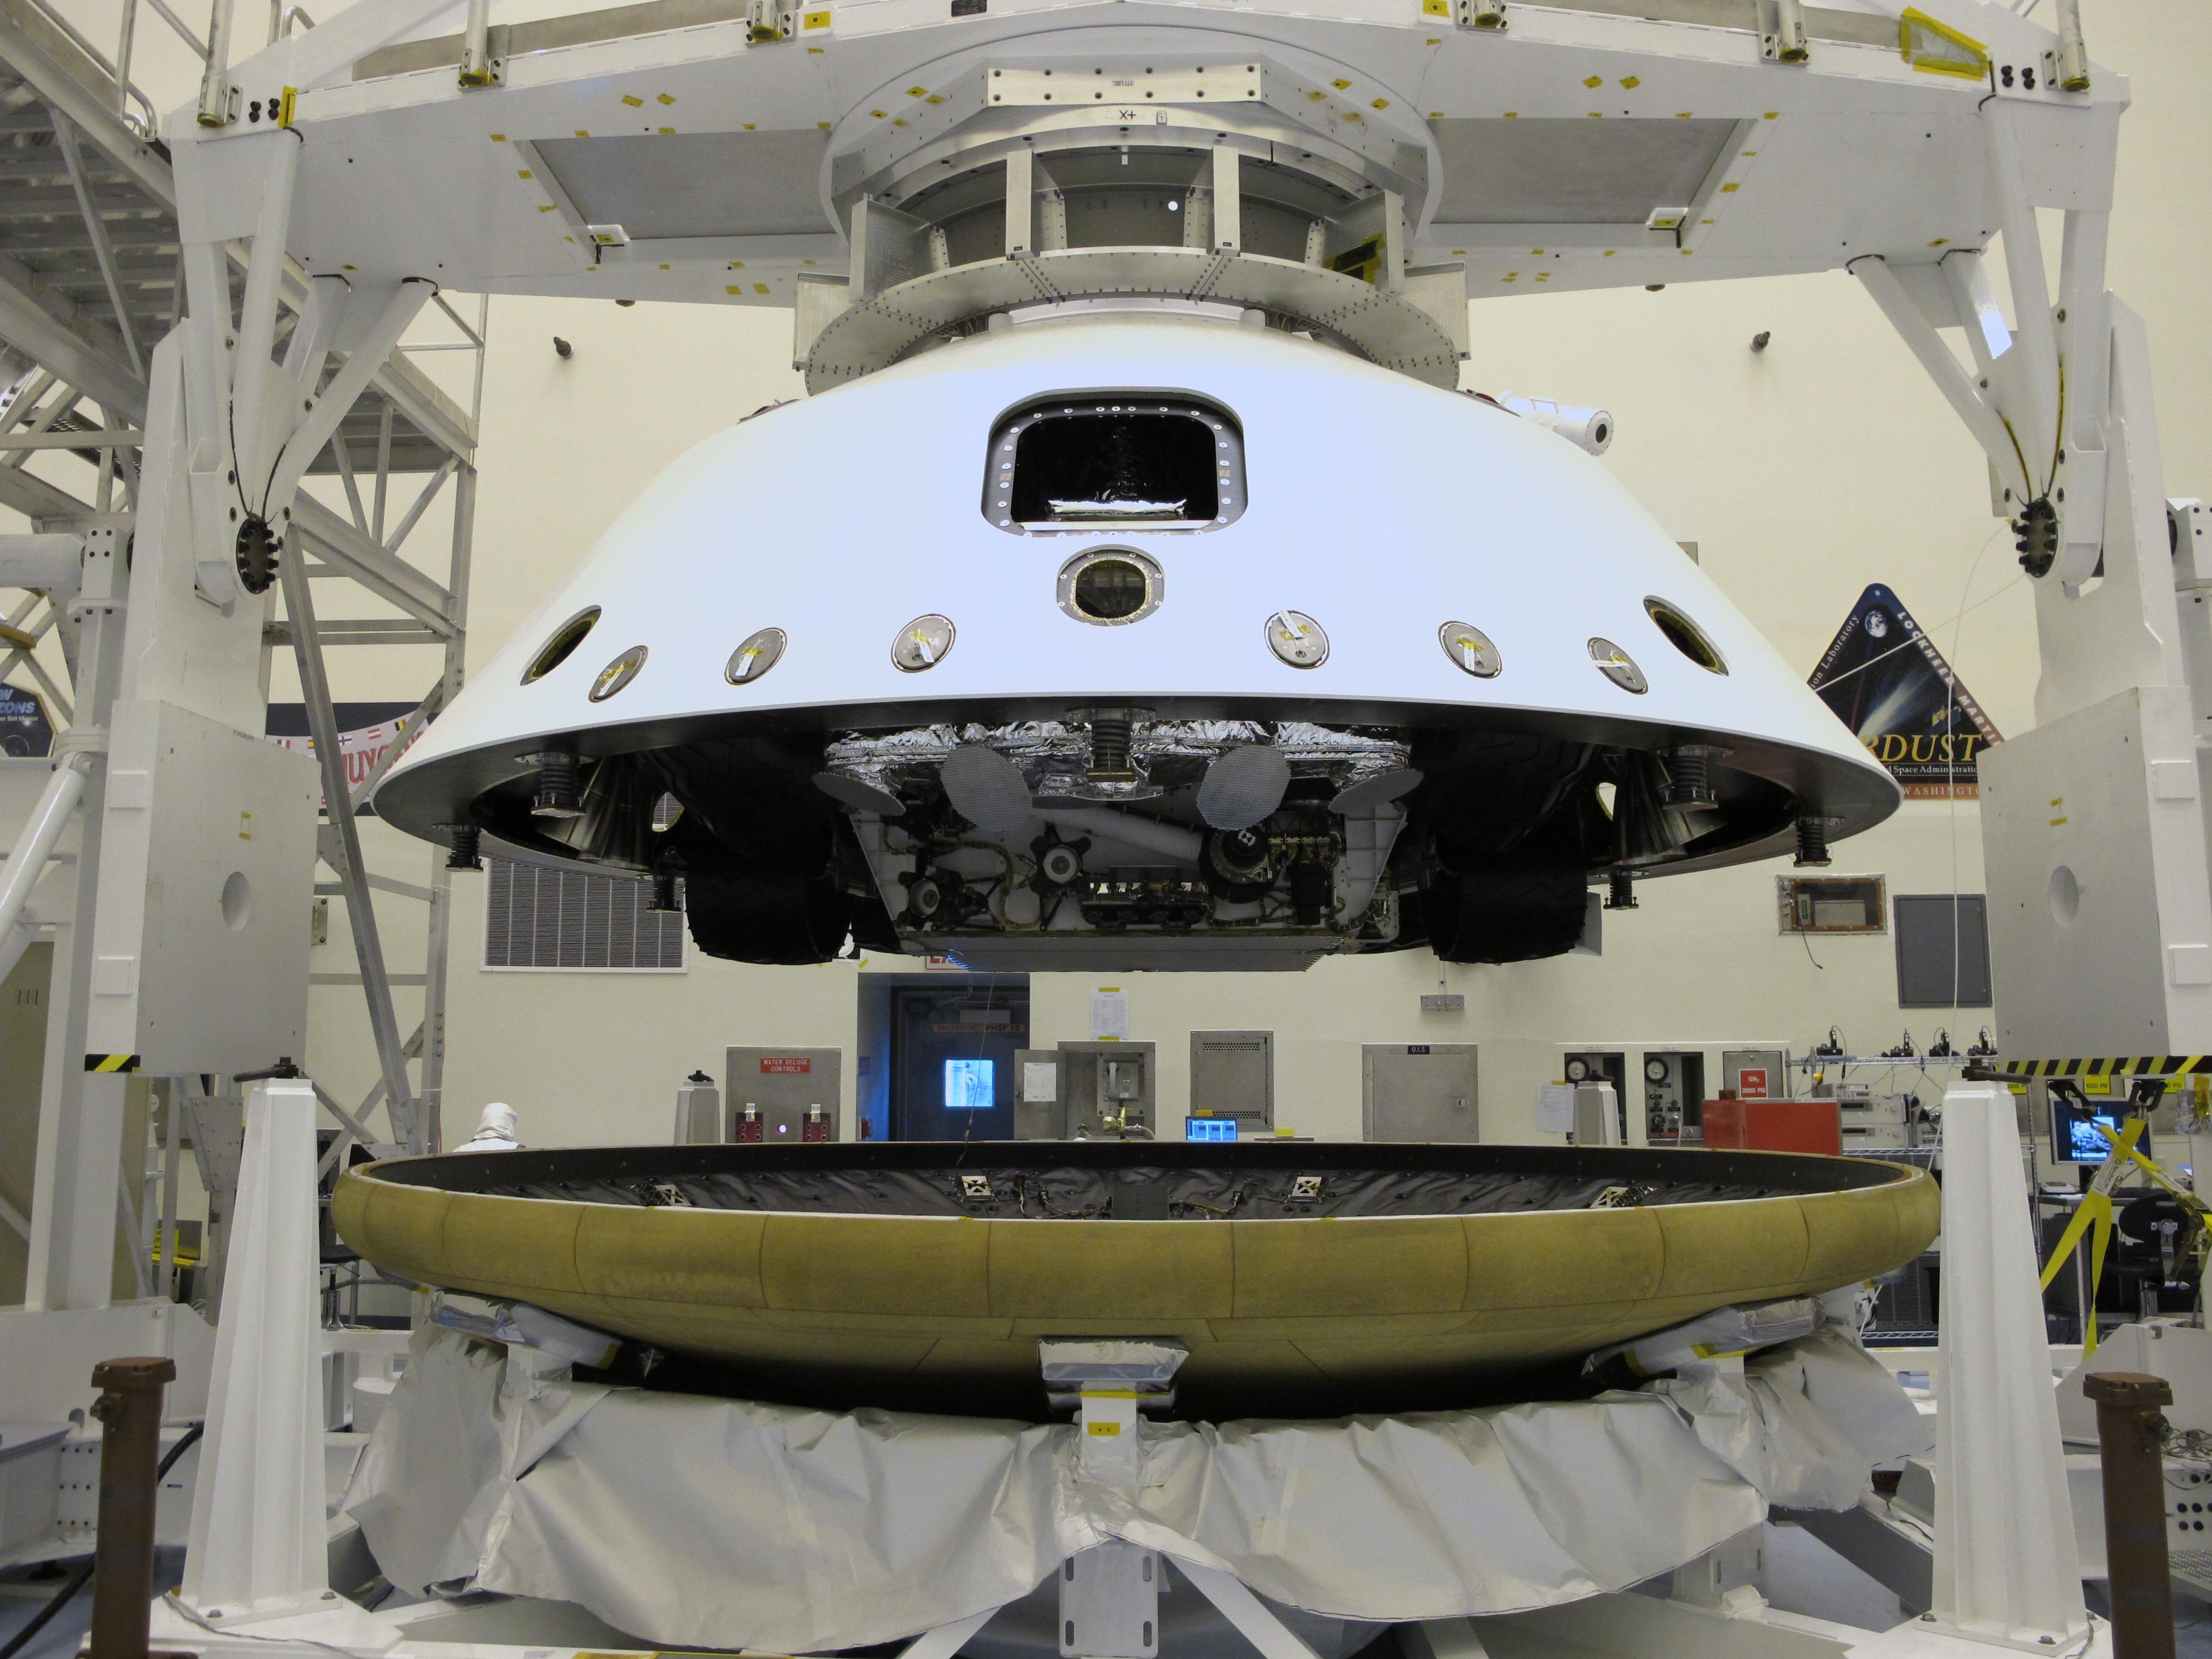 7 Minutes of Terror: Curiosity Rover's Risky Mars Landing |Video » NASA's Curiosity Mars Science Laboratory Rover lands on Mars in August2012